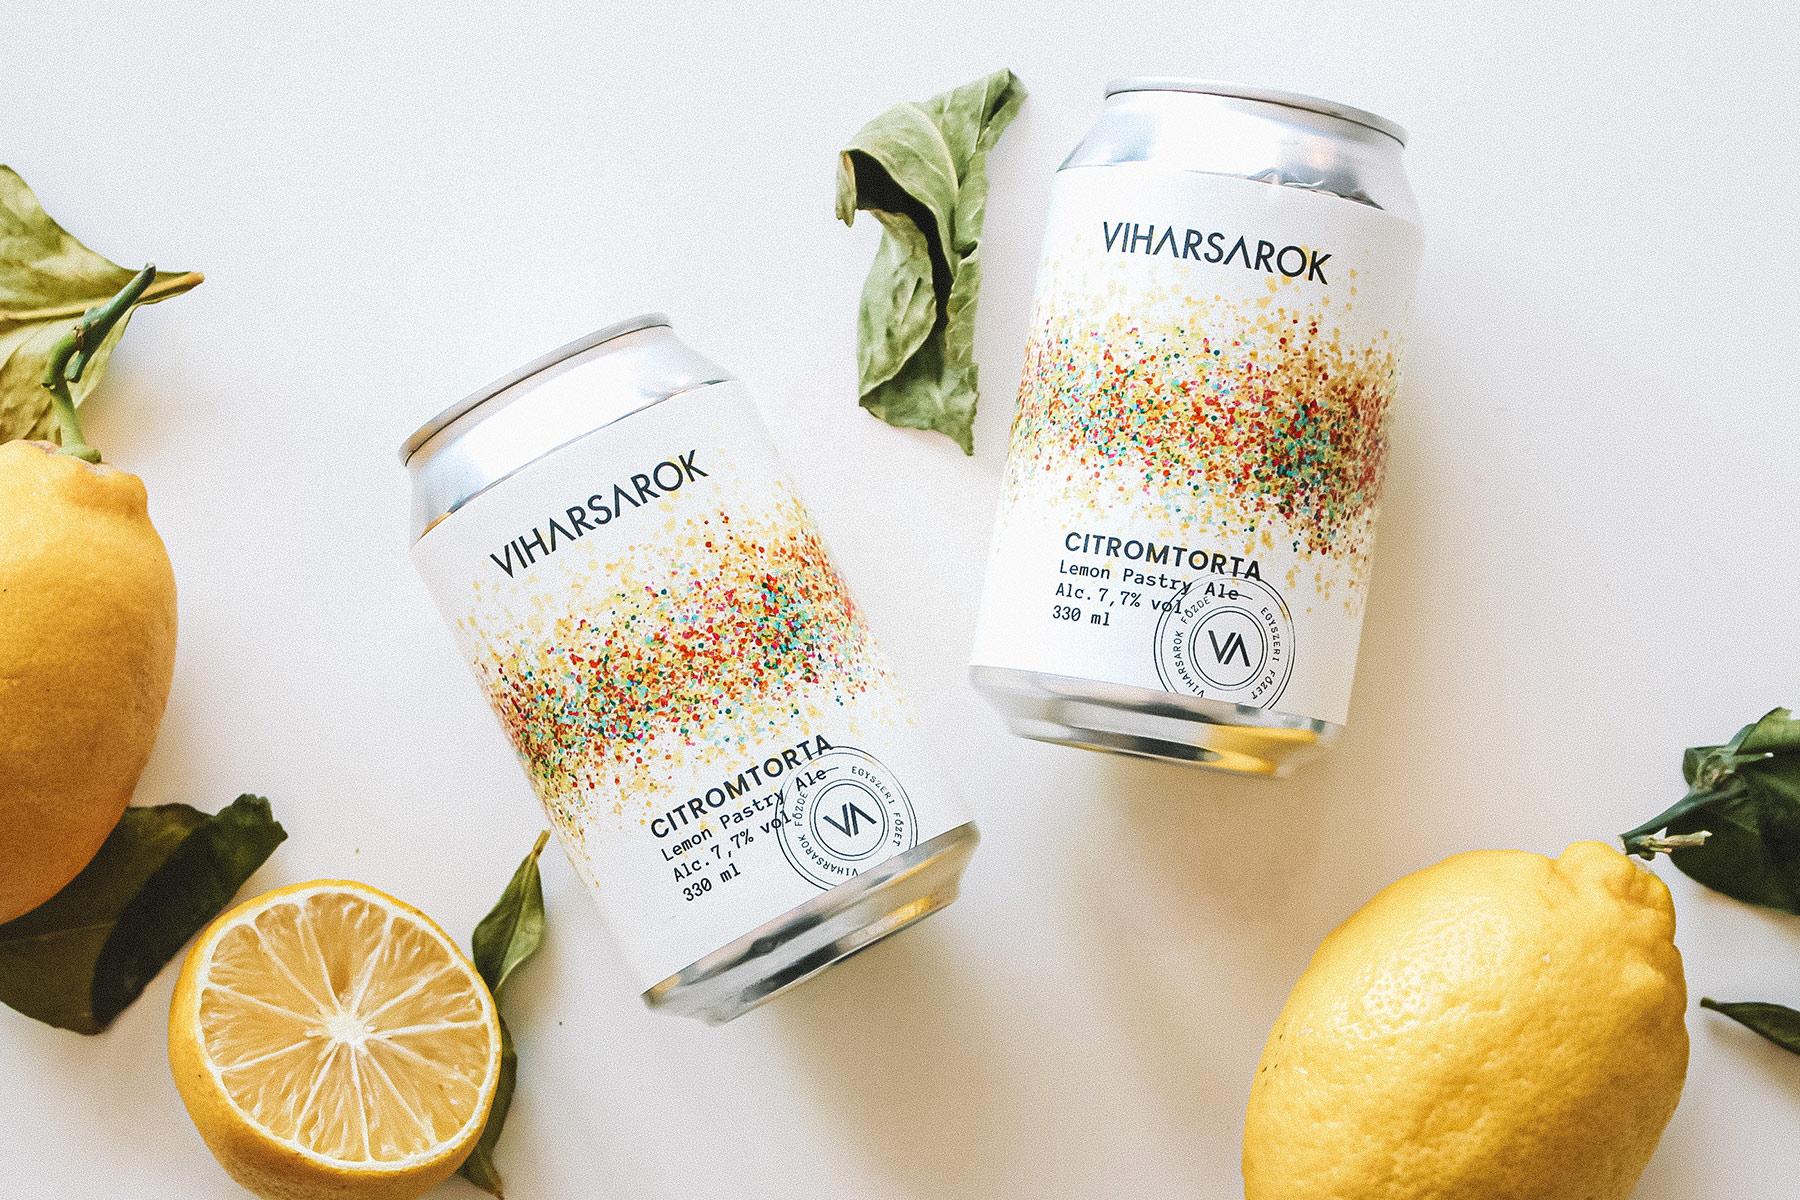 Packaging Design for Viharsarok Lemon Meringue Pie Limited Edition Craft Beer by Studio Nabi